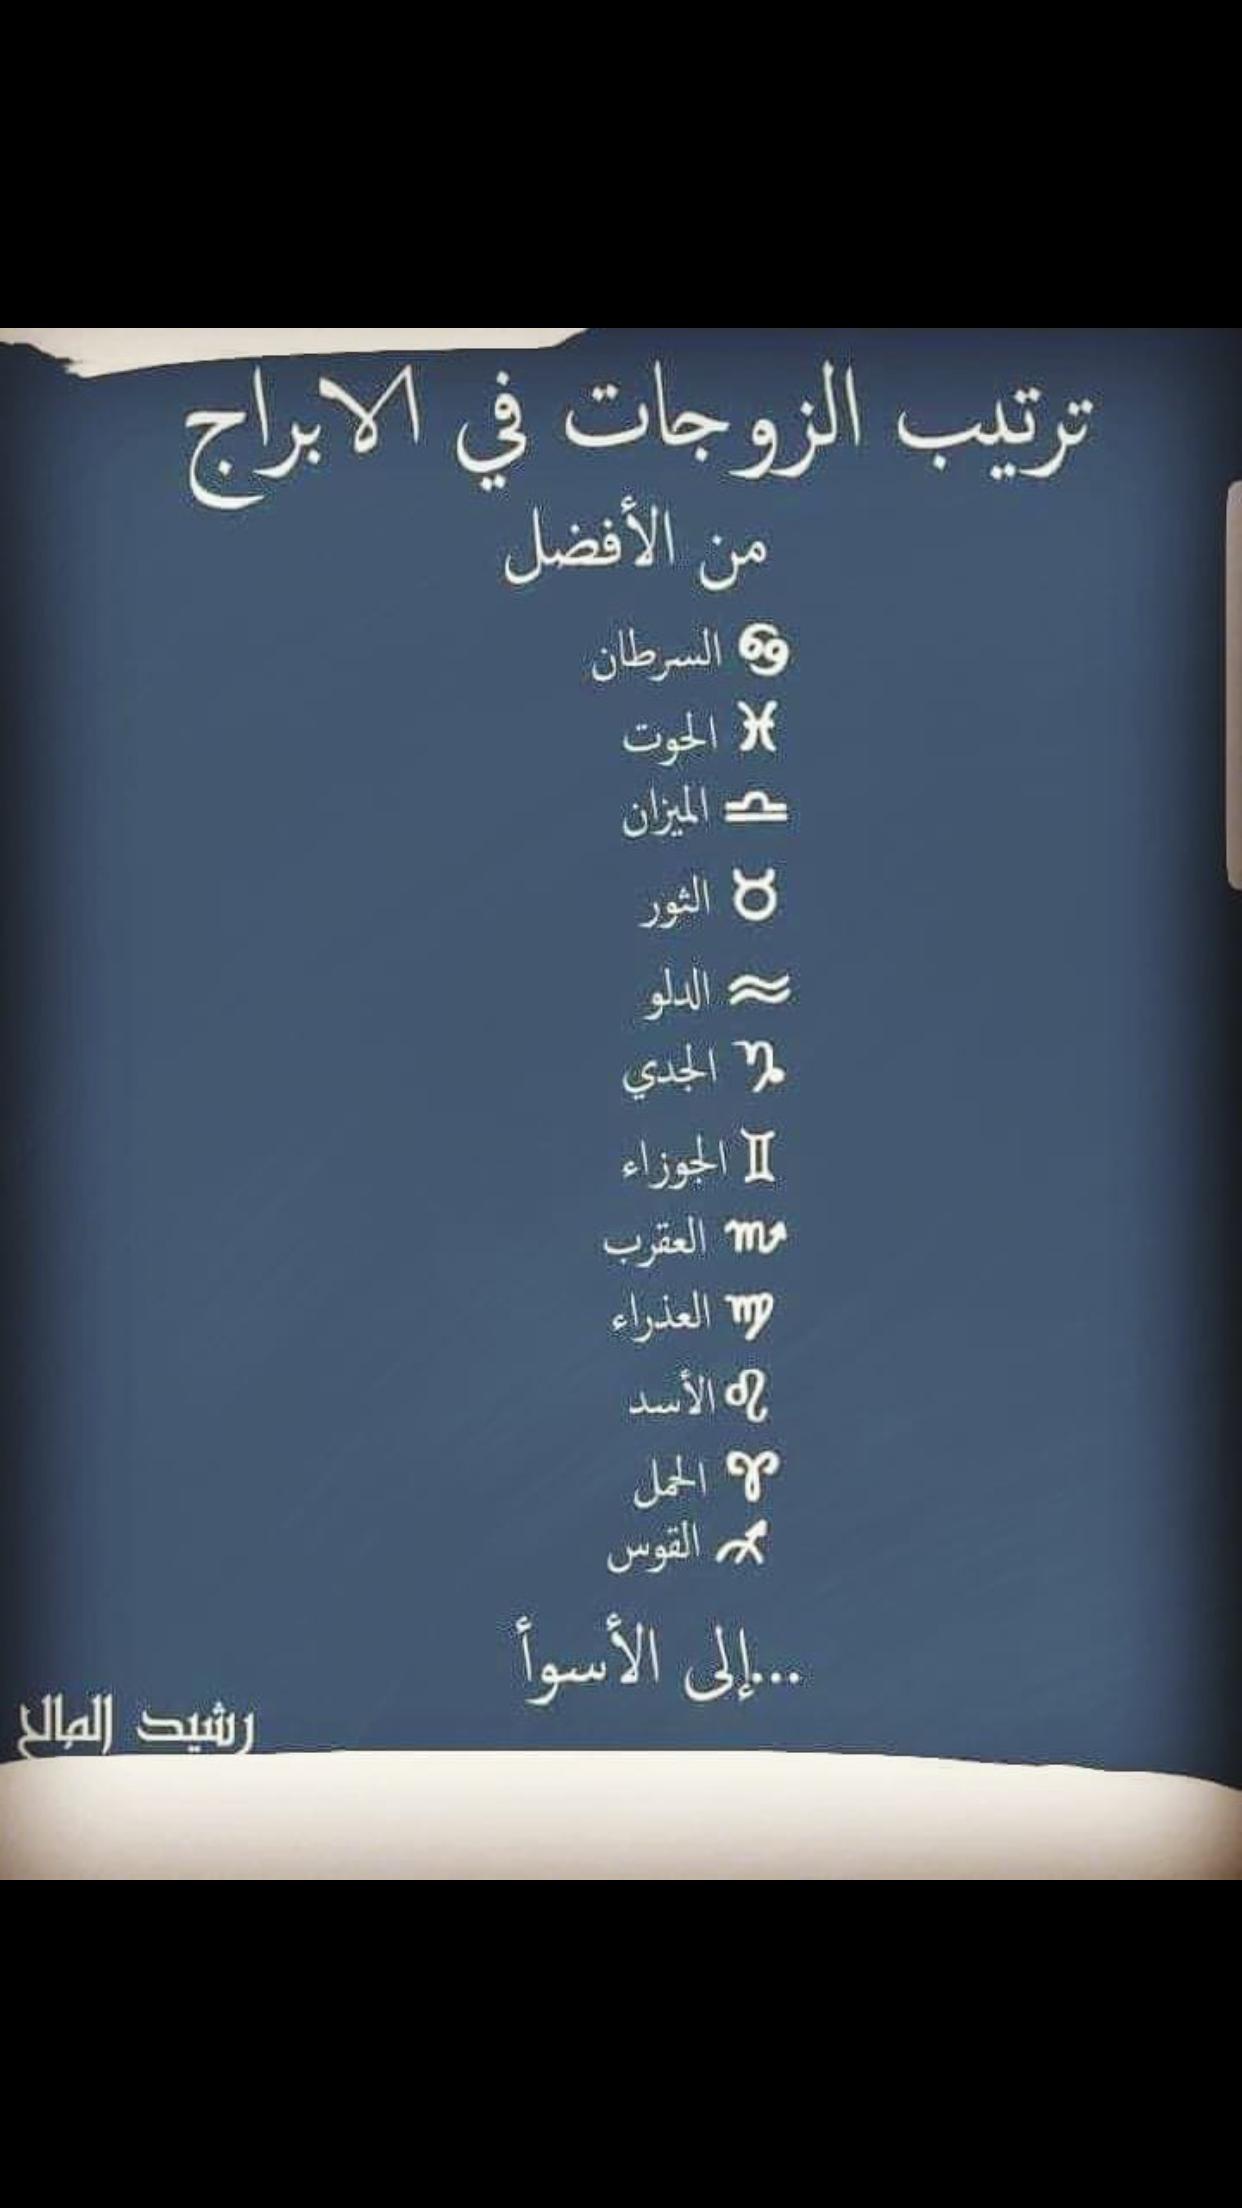 Magic Words Arabic Funny Mood Quotes